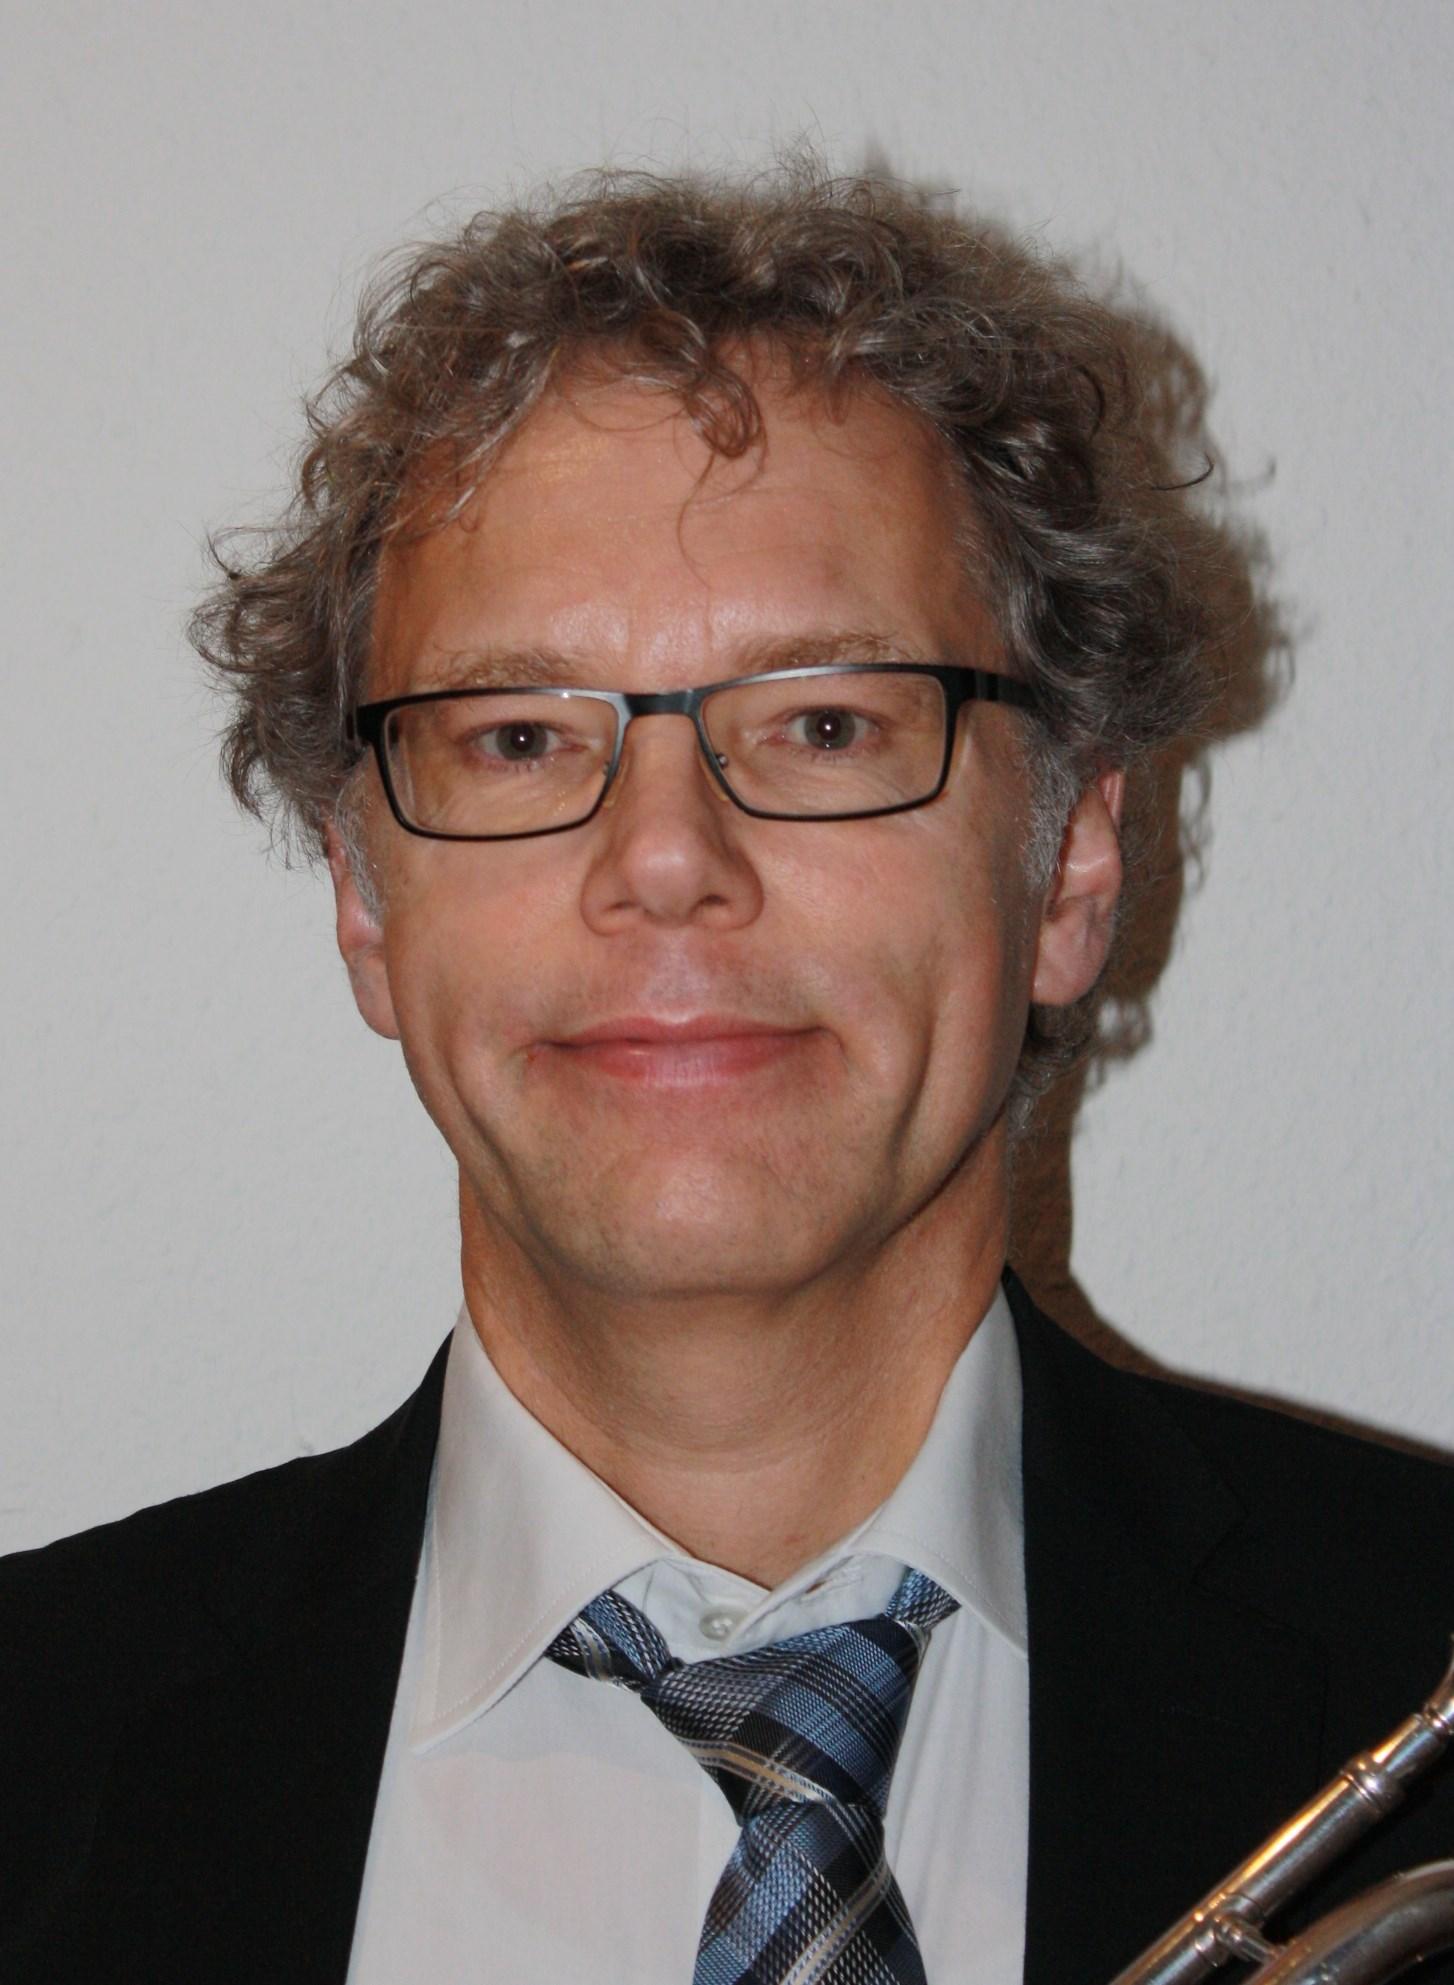 Svend Glüsing